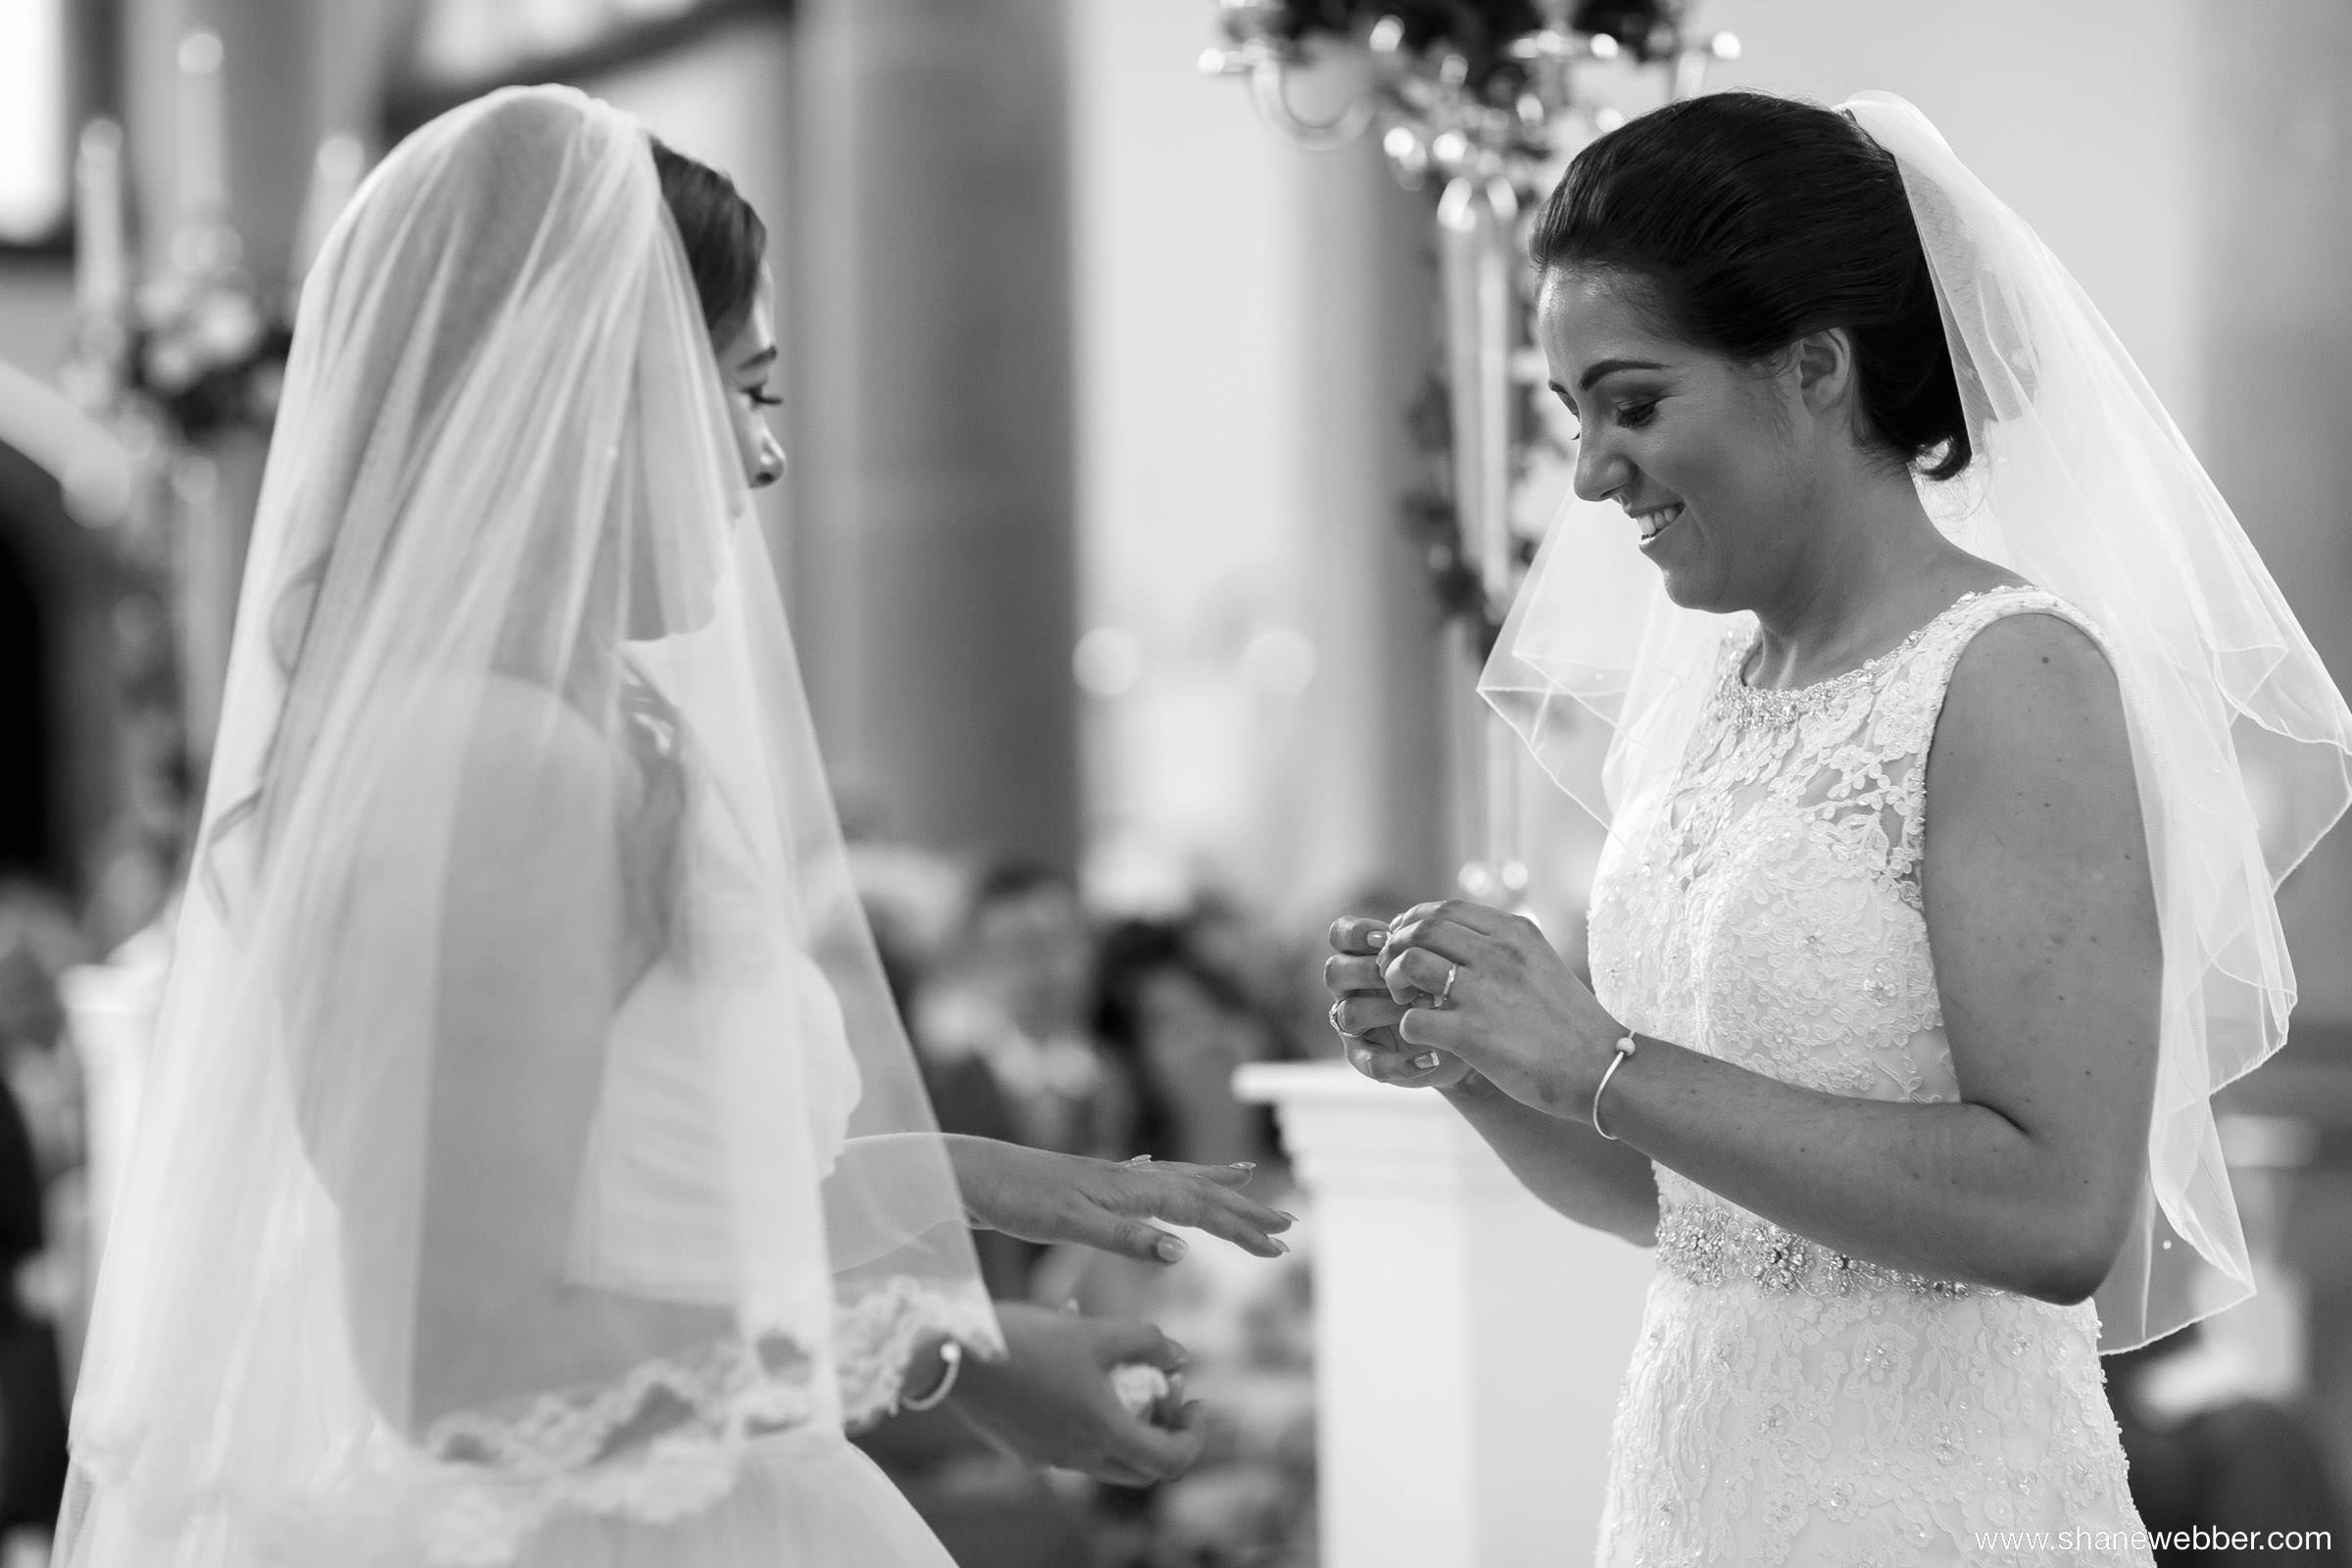 Wedding ceremony at Gorton Monastery Manchester